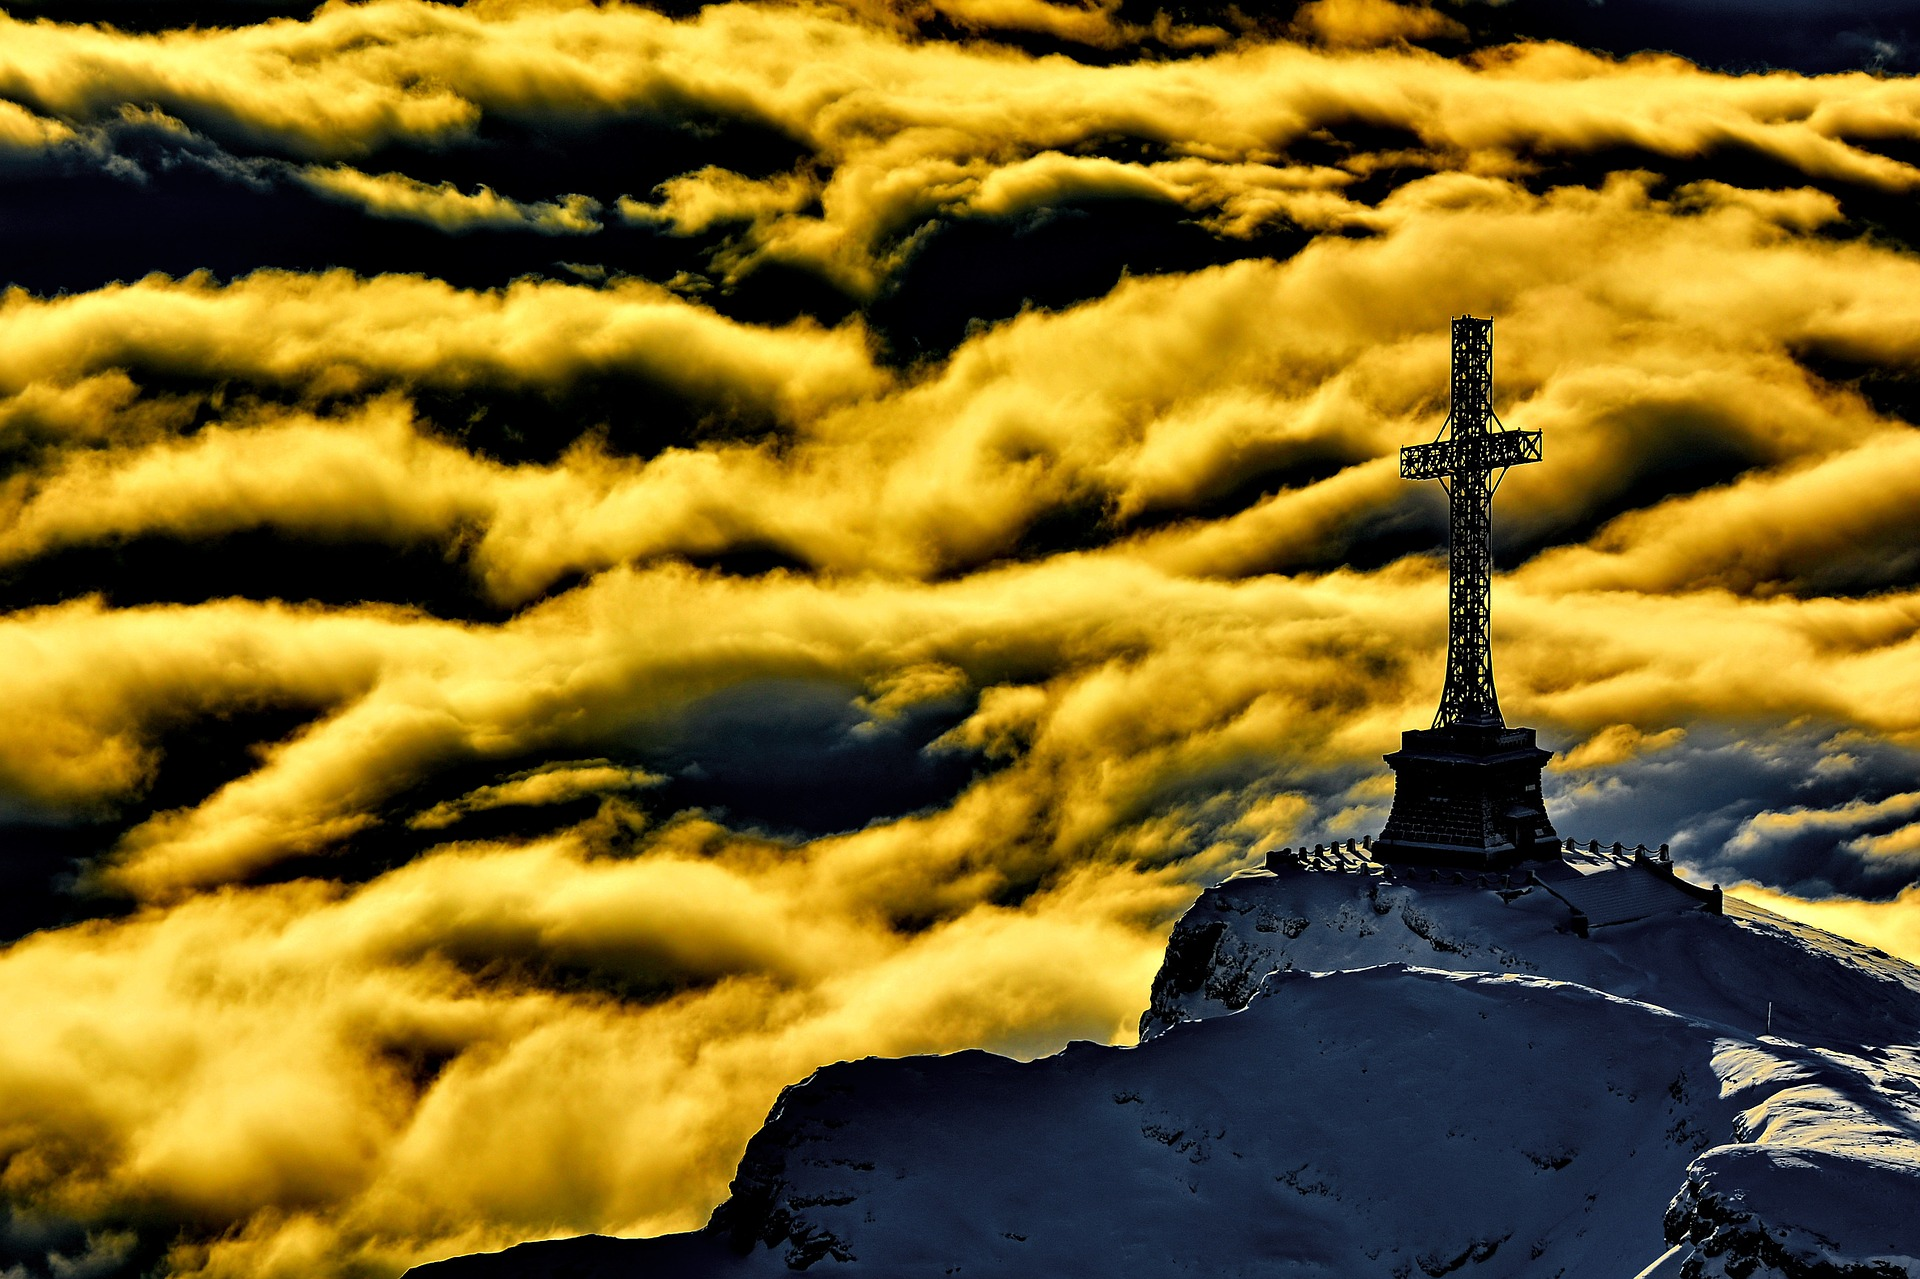 croce in montagna